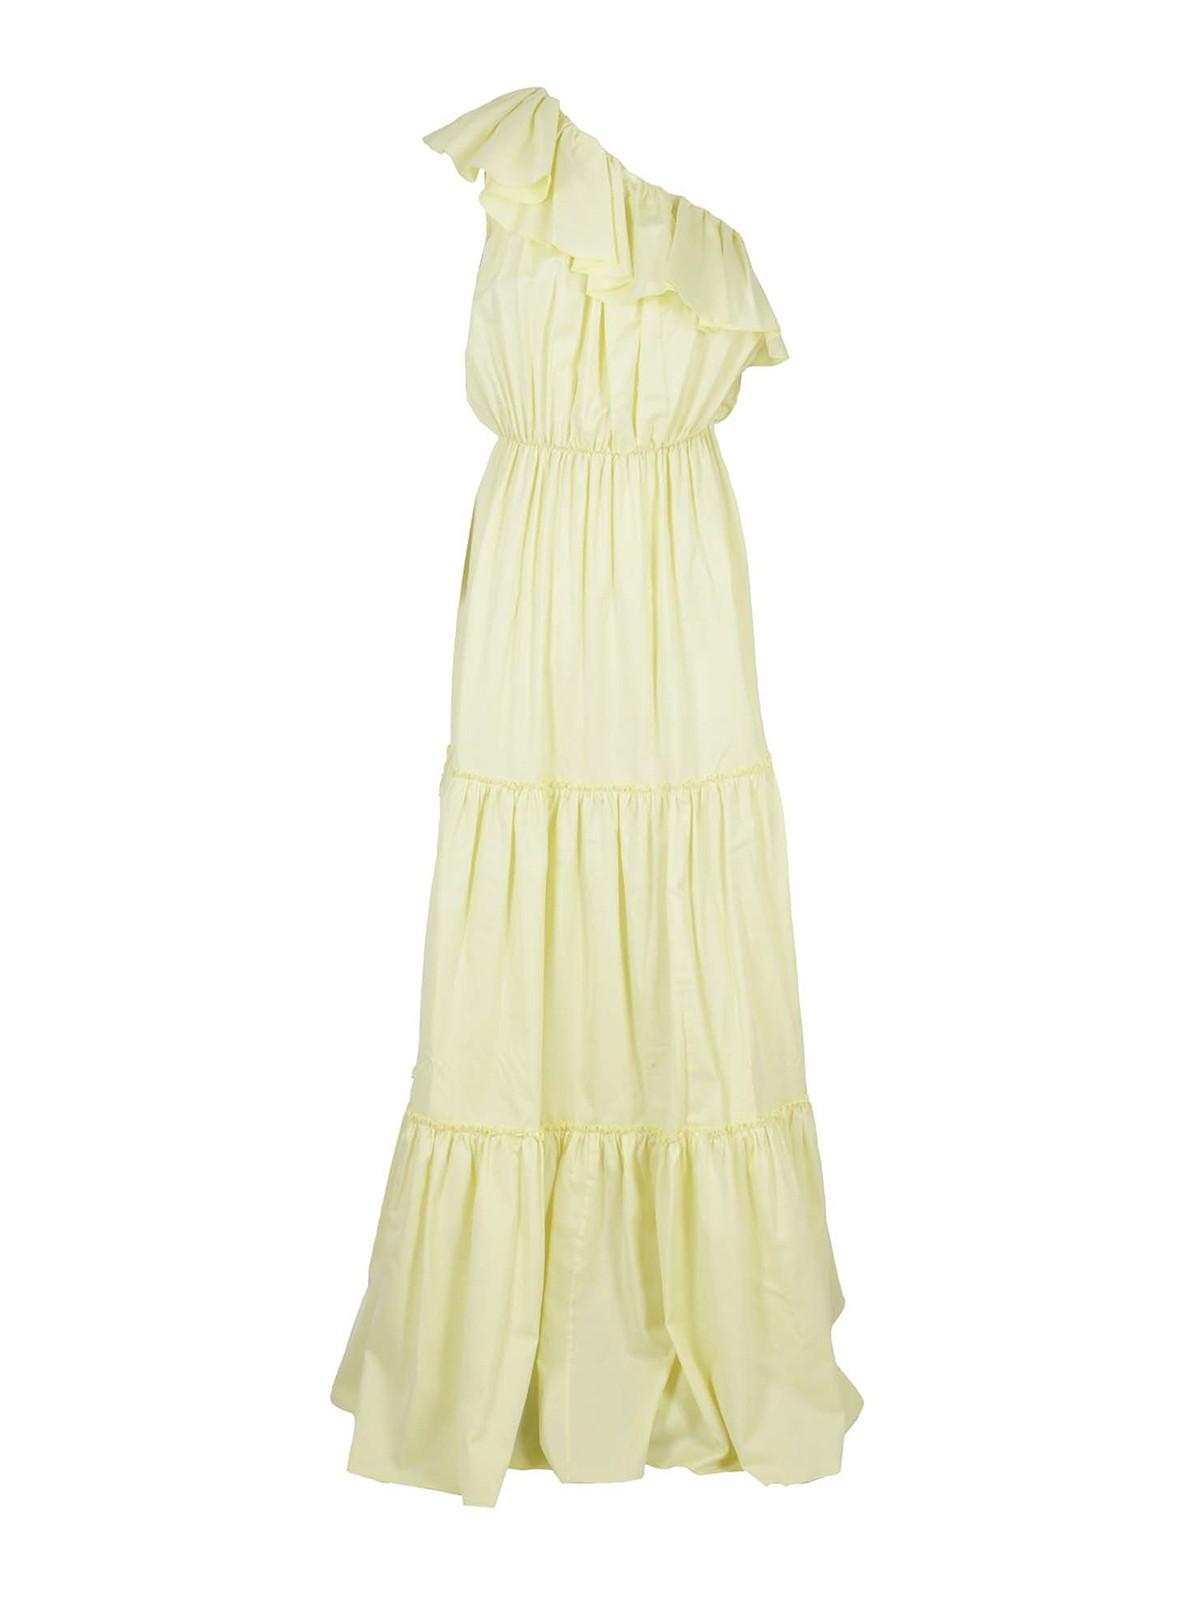 Federica Tosi Clothing ONE SHOULDER FLOUNCED DRESS